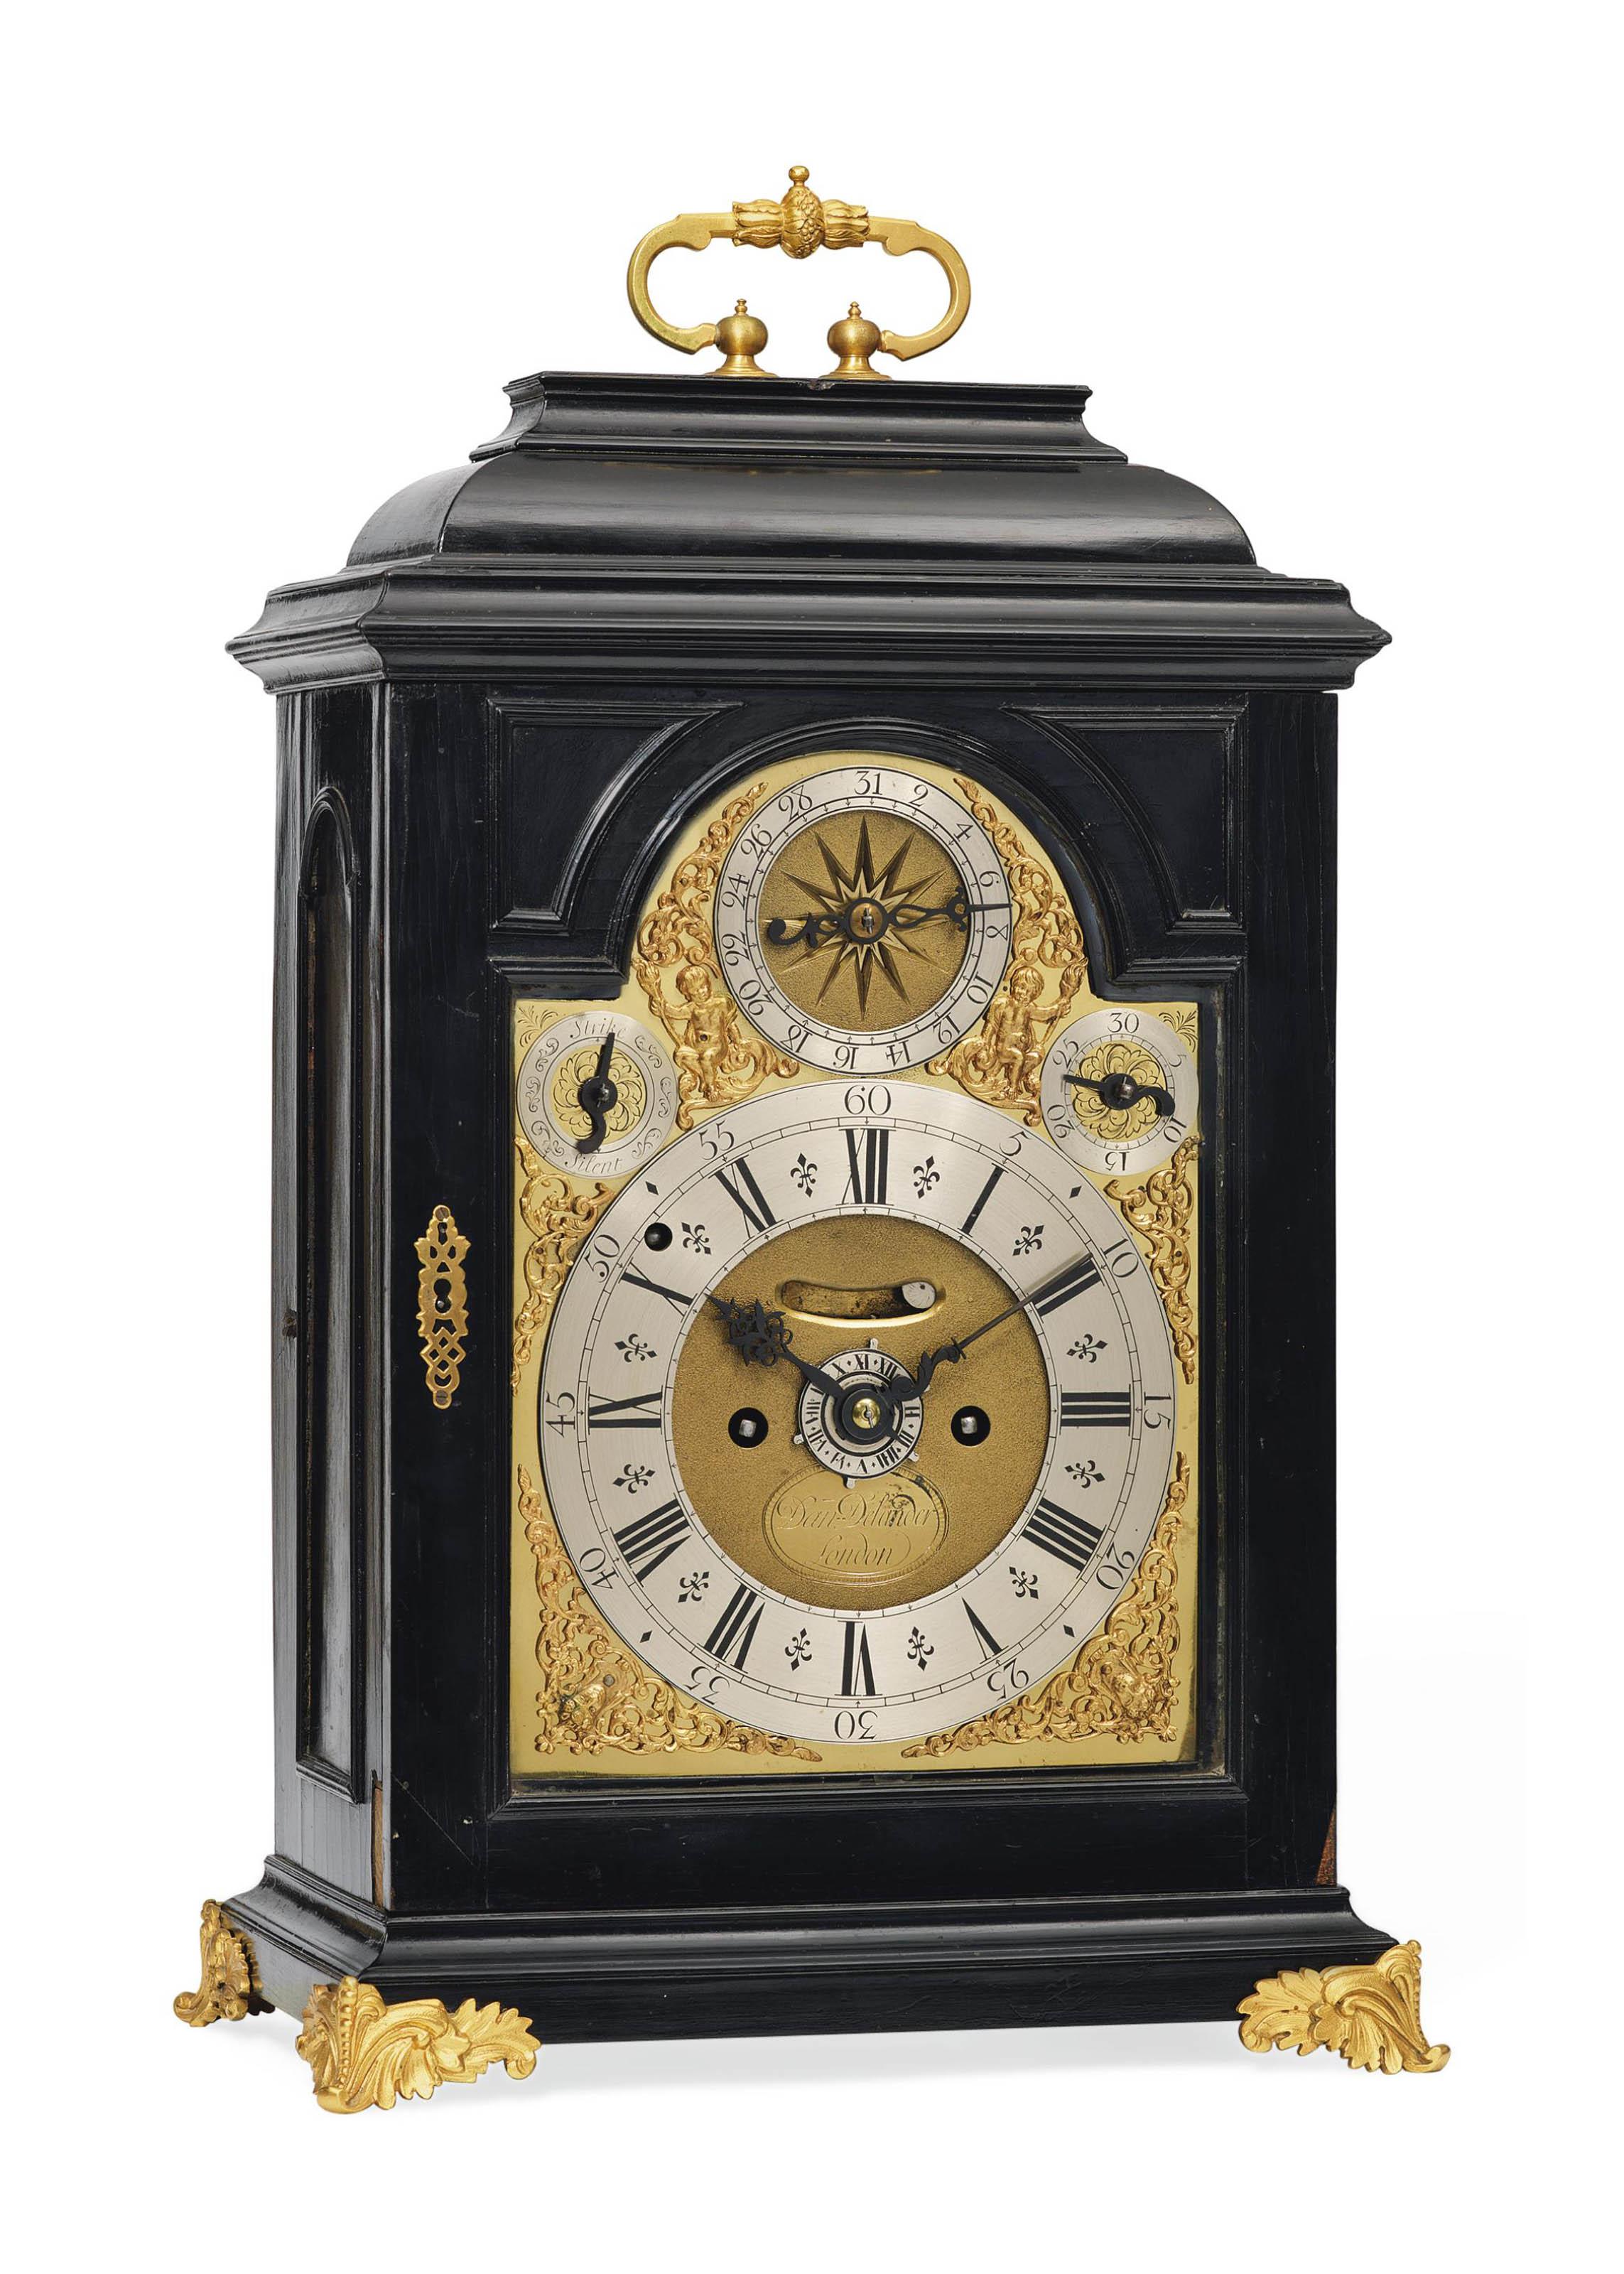 A GEORGE I EBONY-VENEERED STRIKING EIGHT-DAY TABLE CLOCK